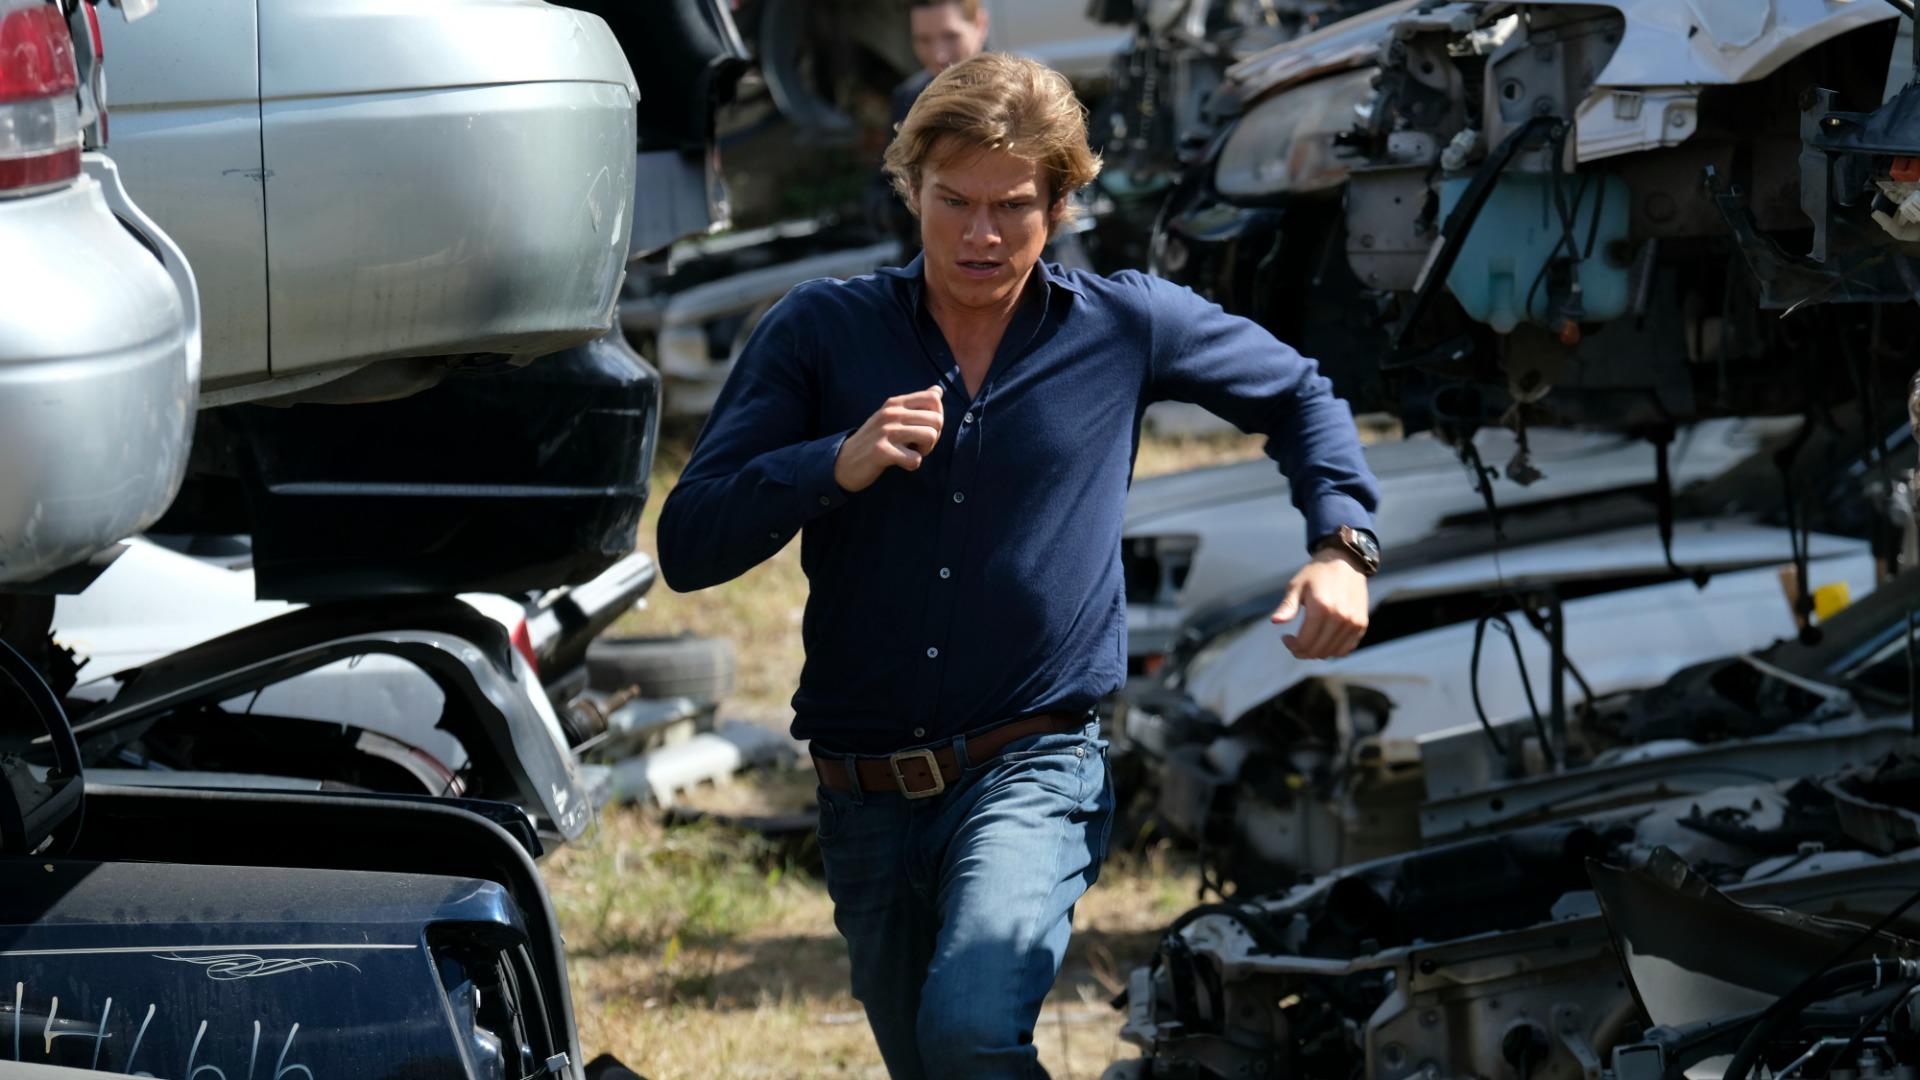 MacGyver runs for his life.